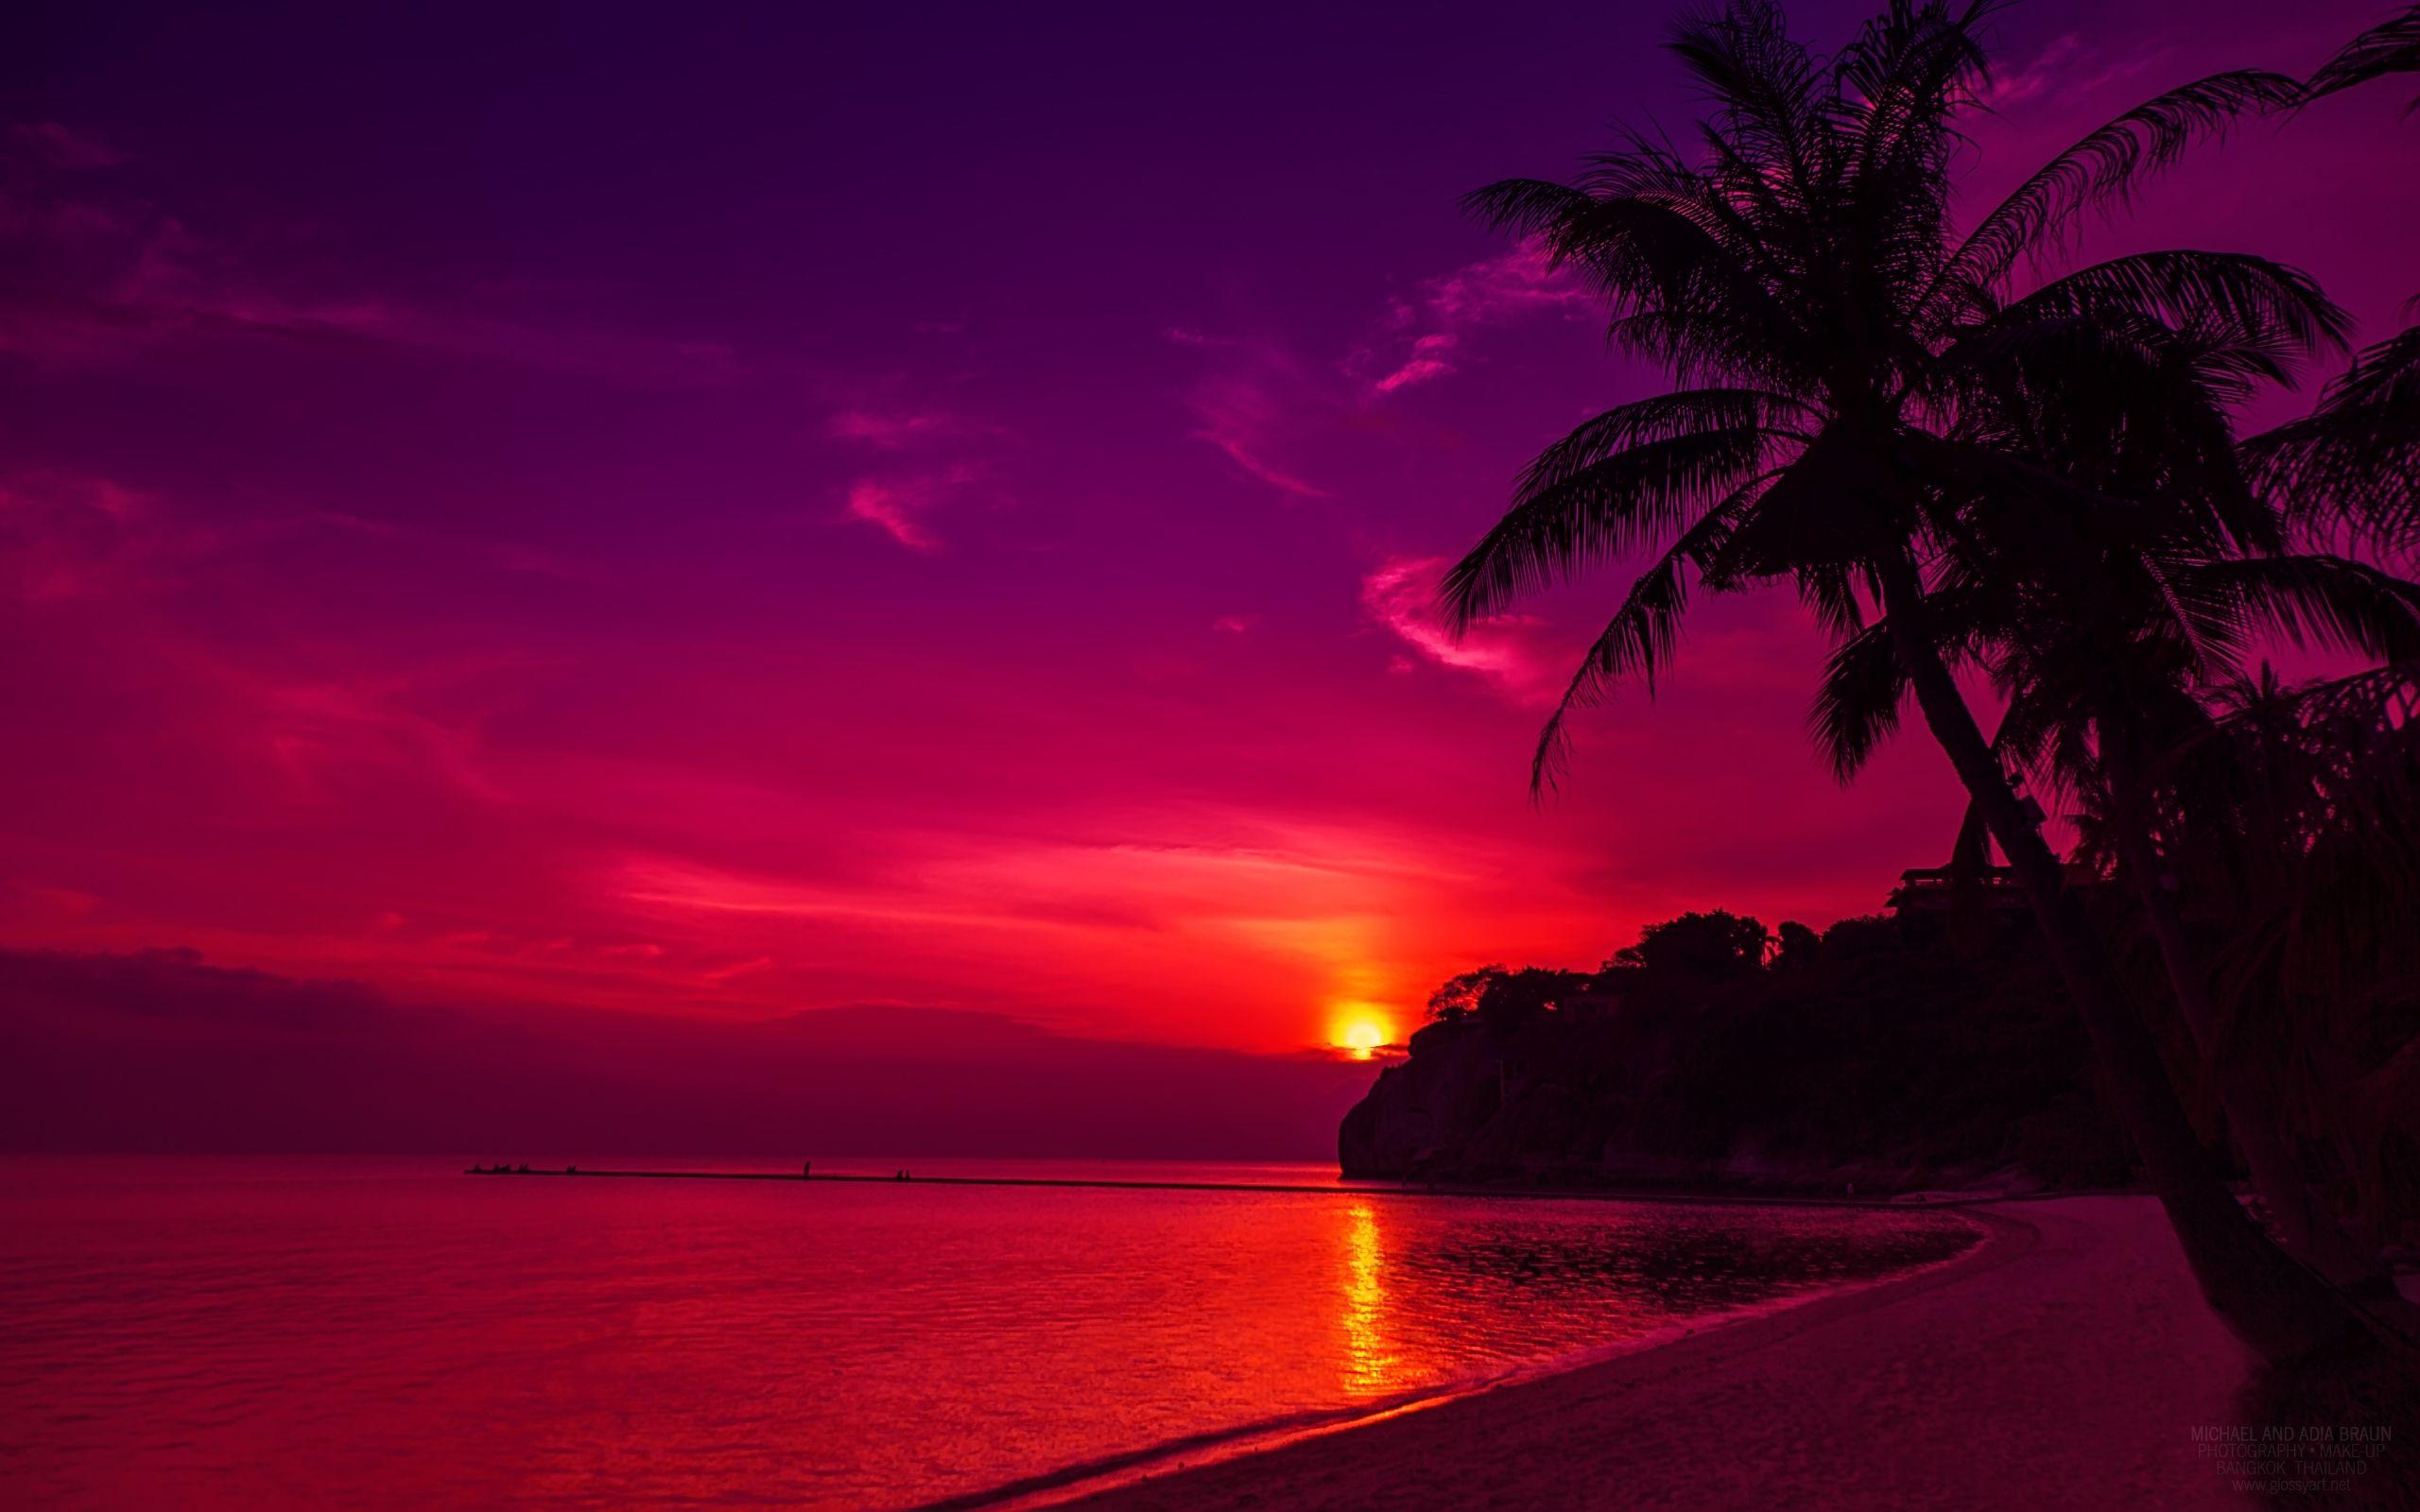 HD Wallpapers Lake Sunsets